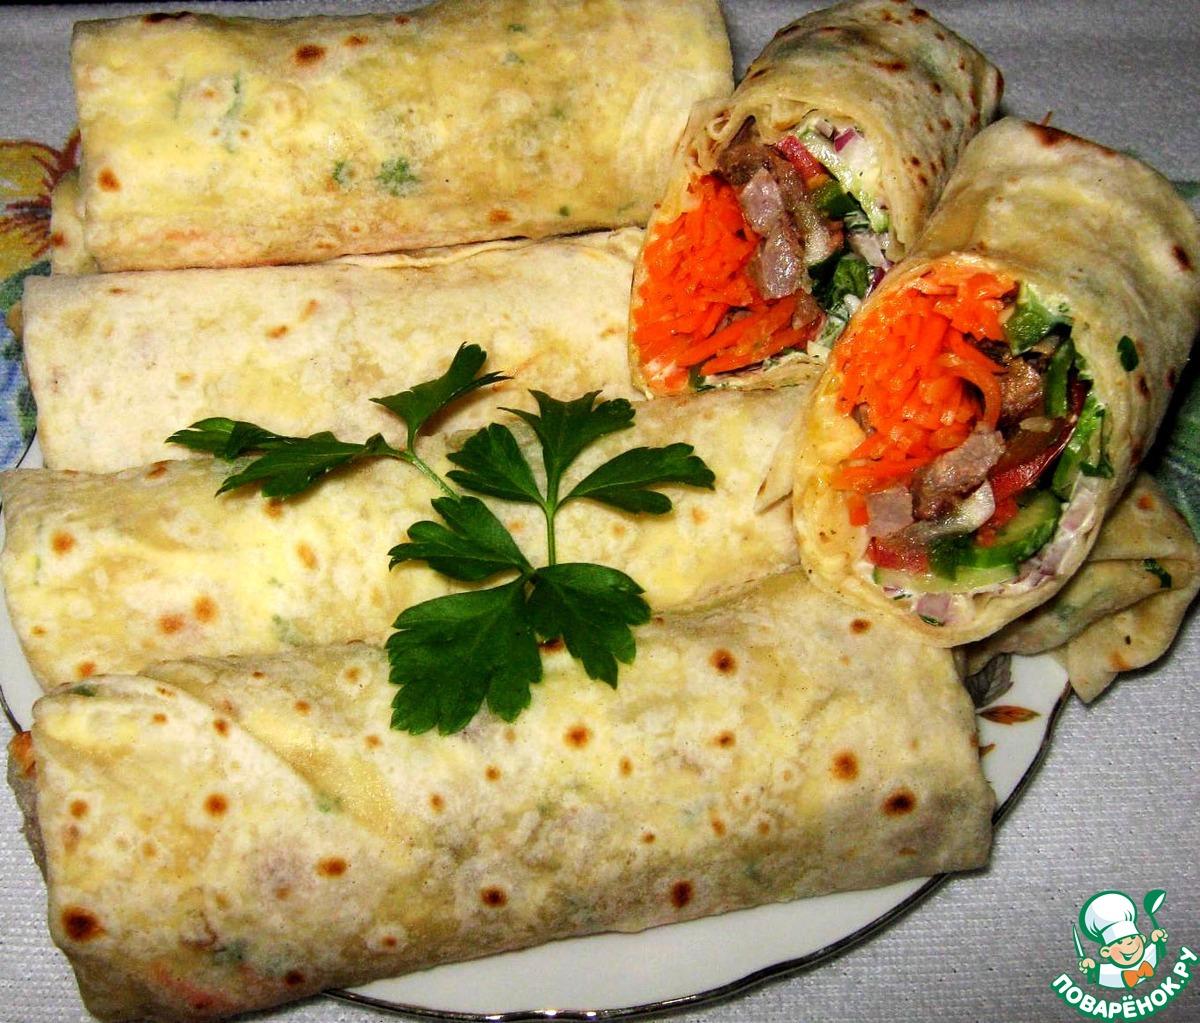 Шаурма с курицей и морковкой по-корейски в домашних условиях рецепт